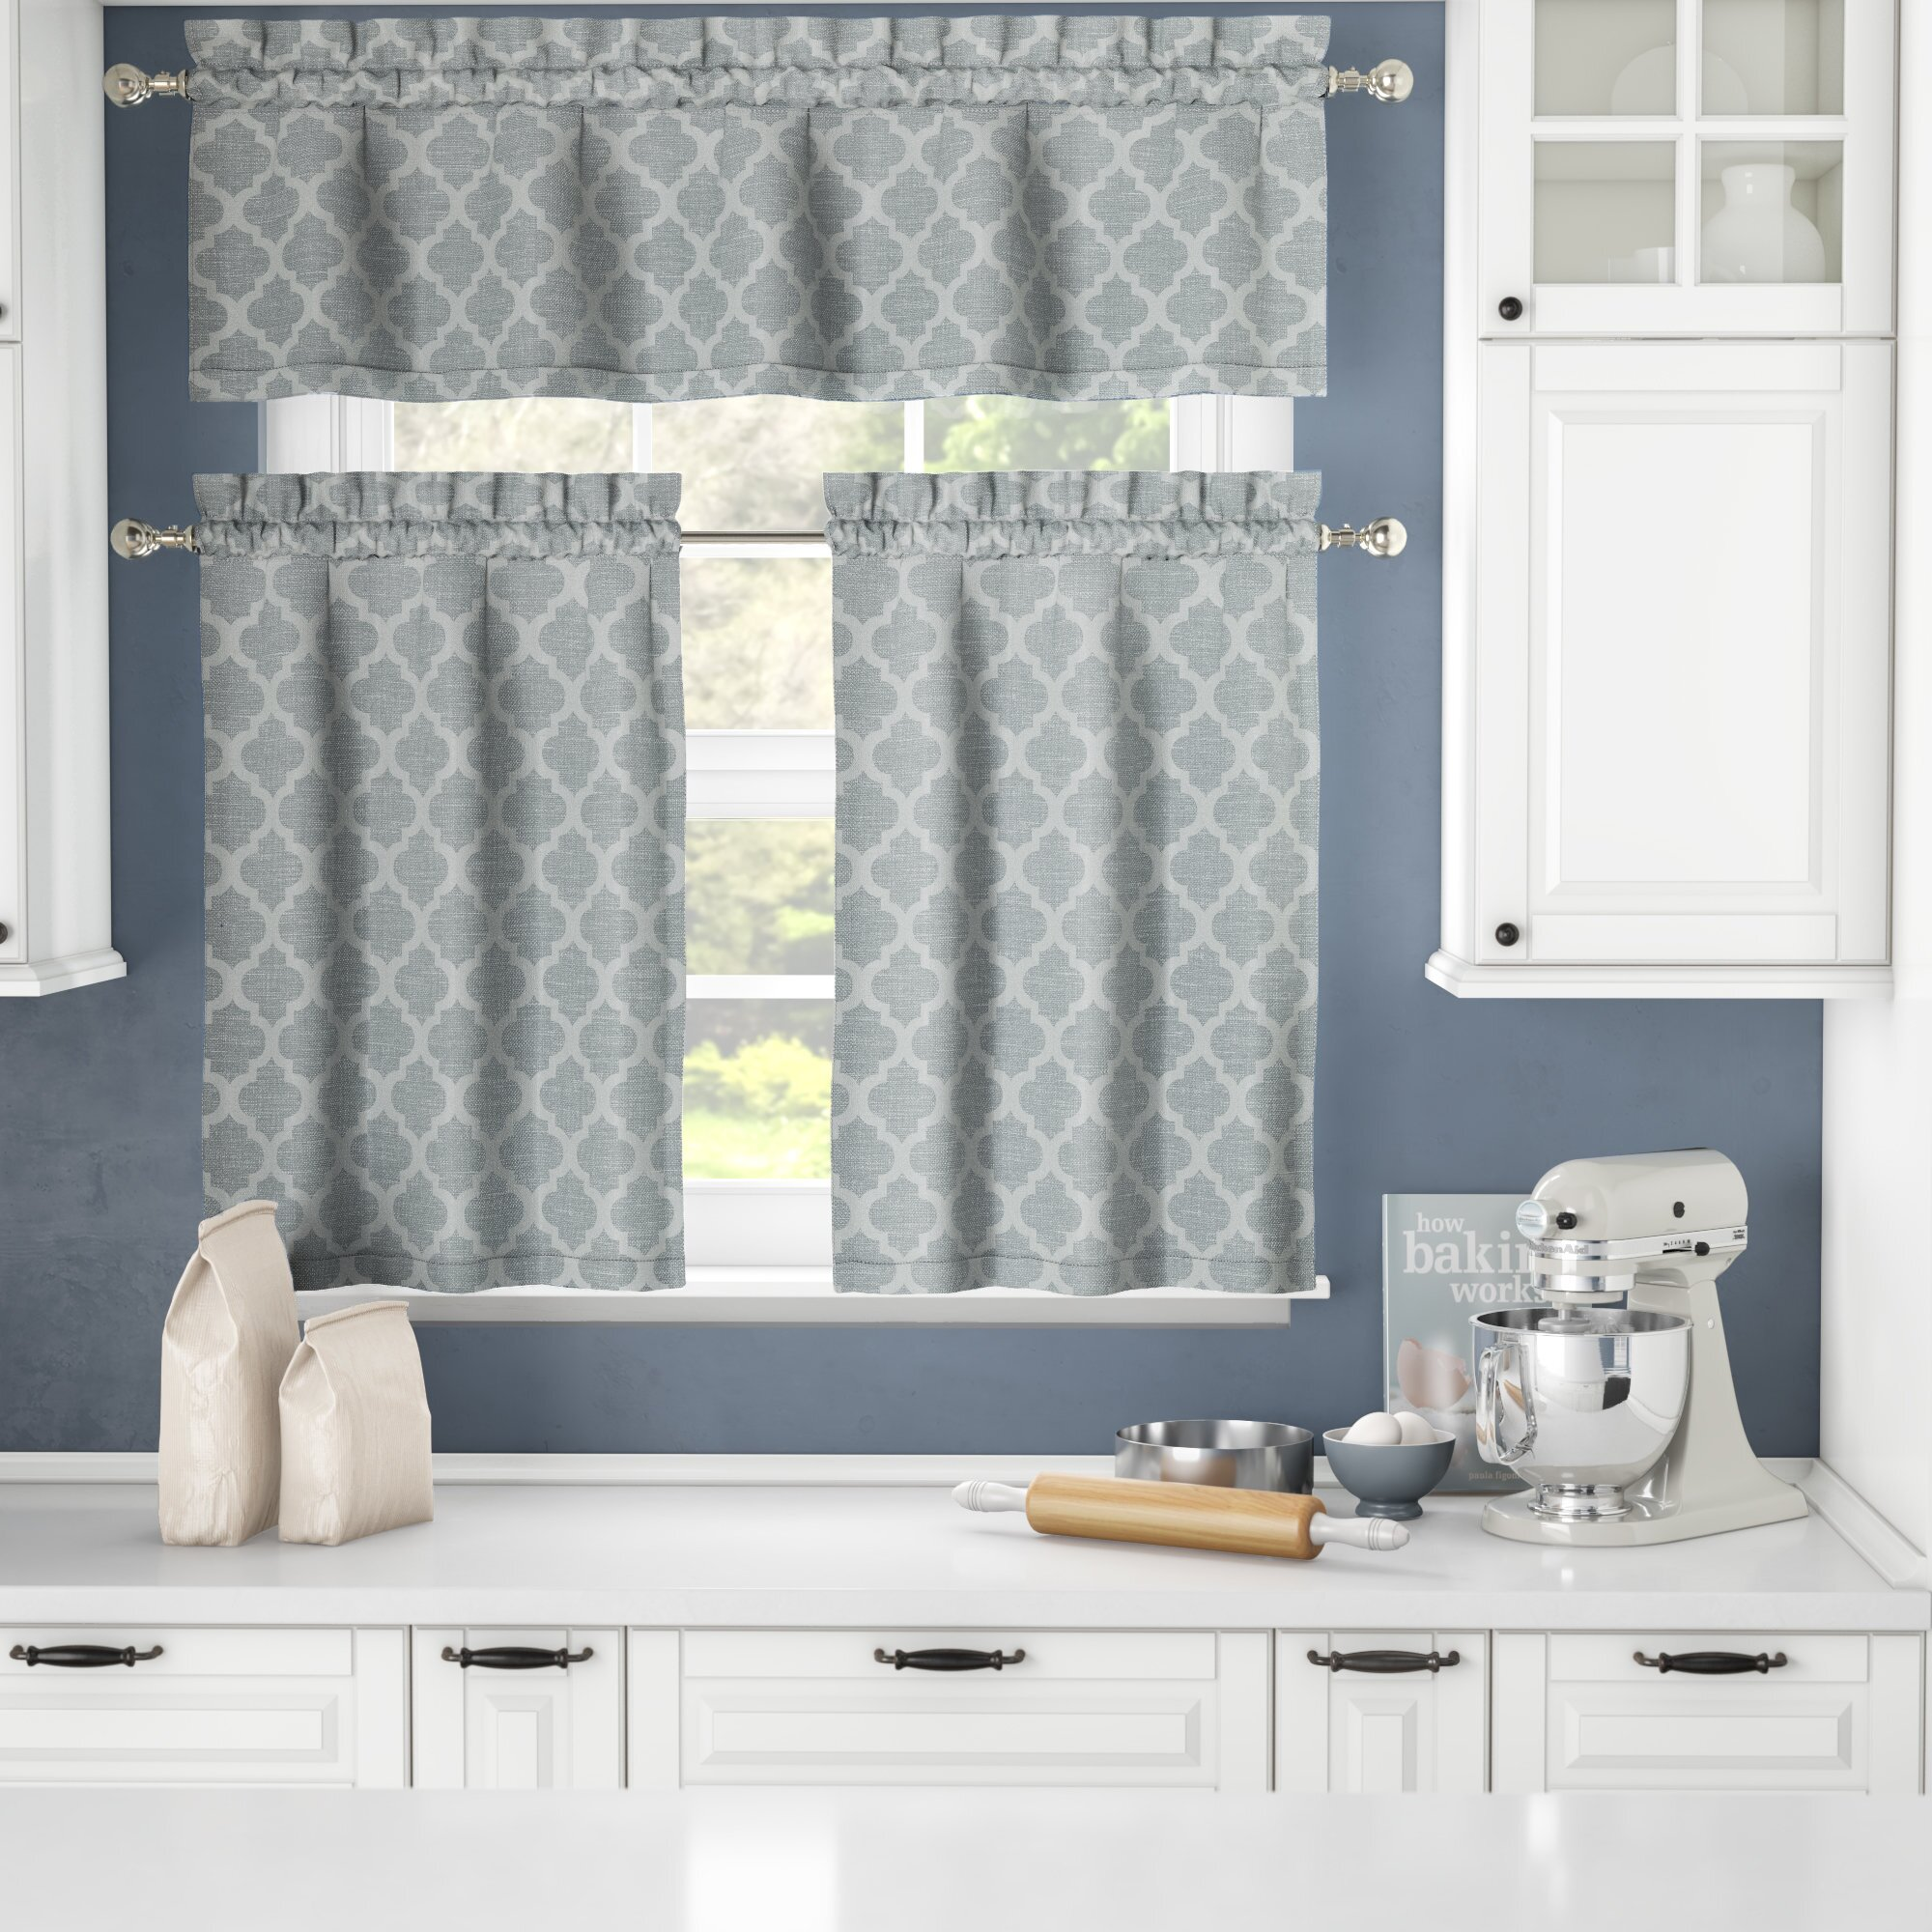 Darby home co otis 3 piece jacquard kitchen curtain set reviews wayfair